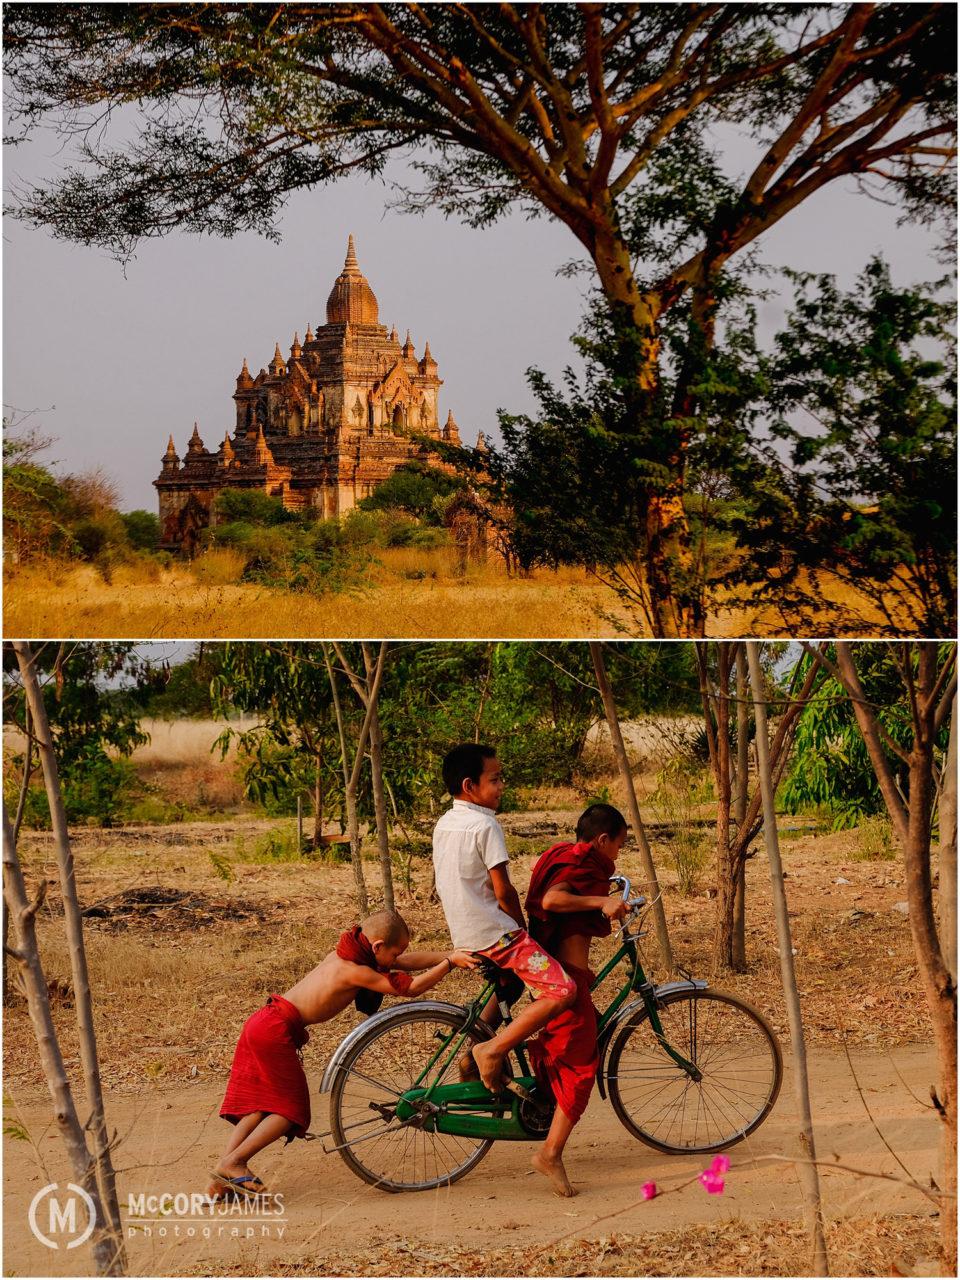 myanmar_missiont_trip_0023